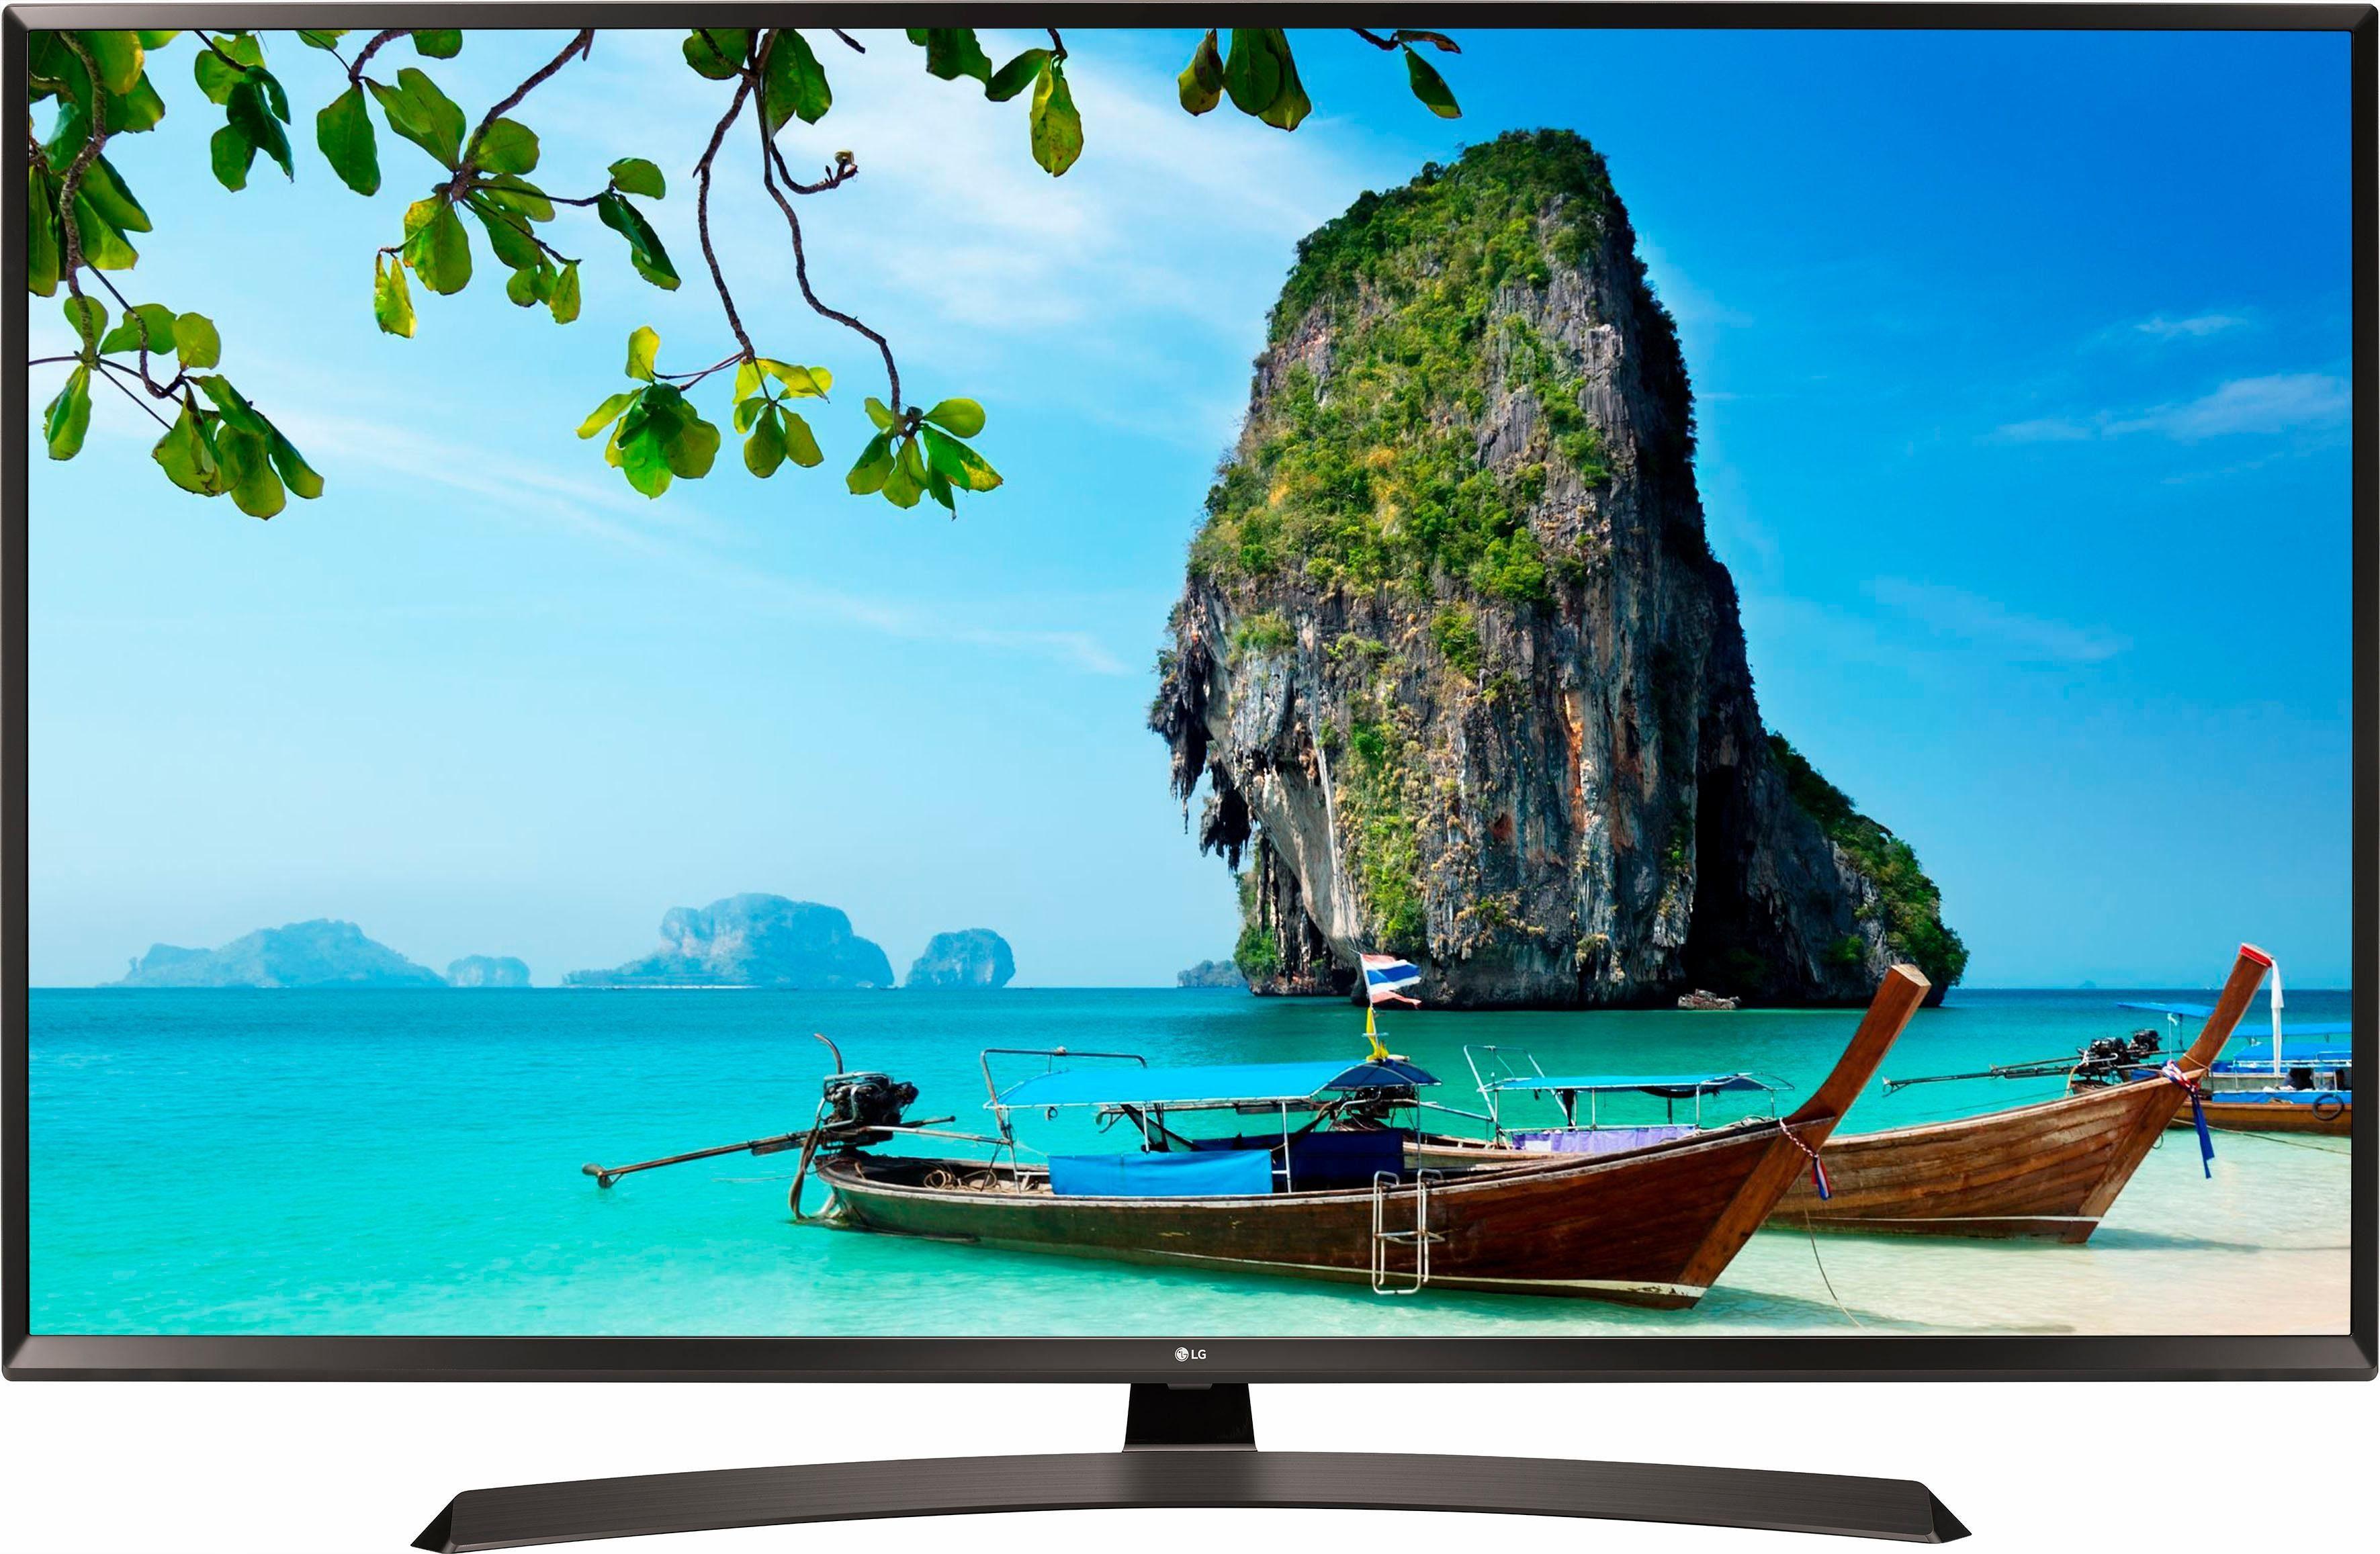 LG 55UJ634V LED-Fernseher (55 Zoll, 4K Ultra HD, Smart-TV)